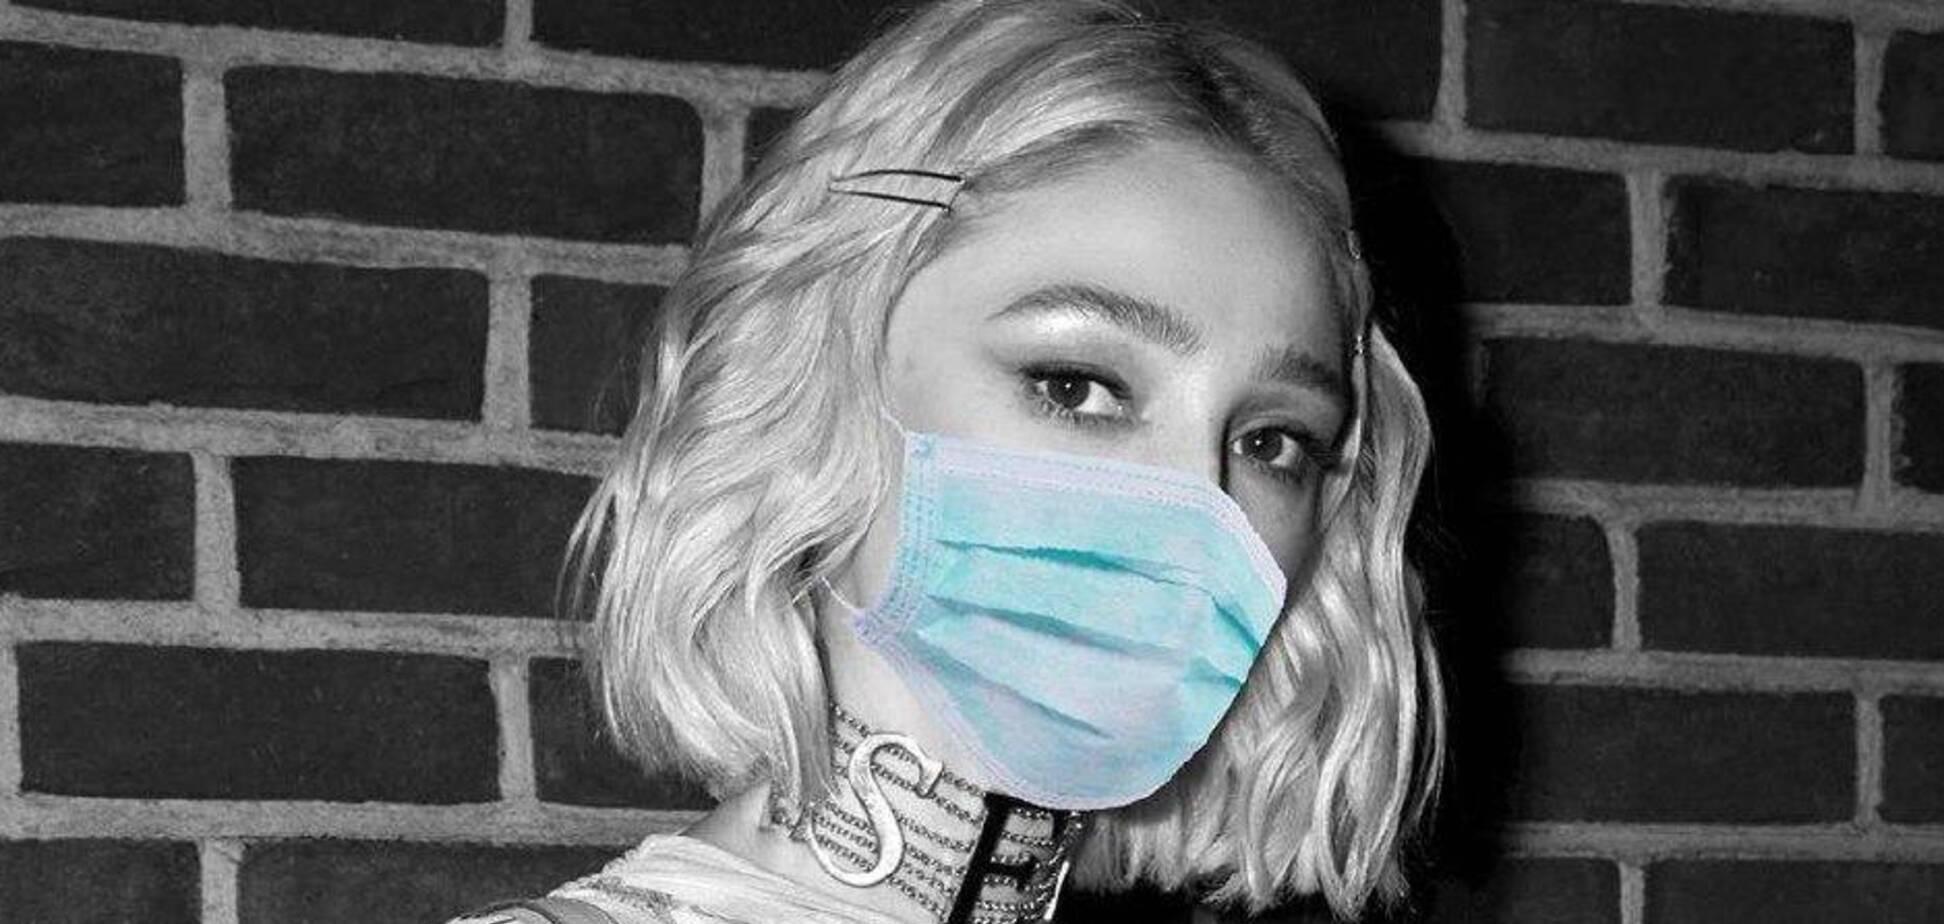 Ивлеева рассказала о протекании коронавируса (фото: Instagram Насти Ивлеевой)